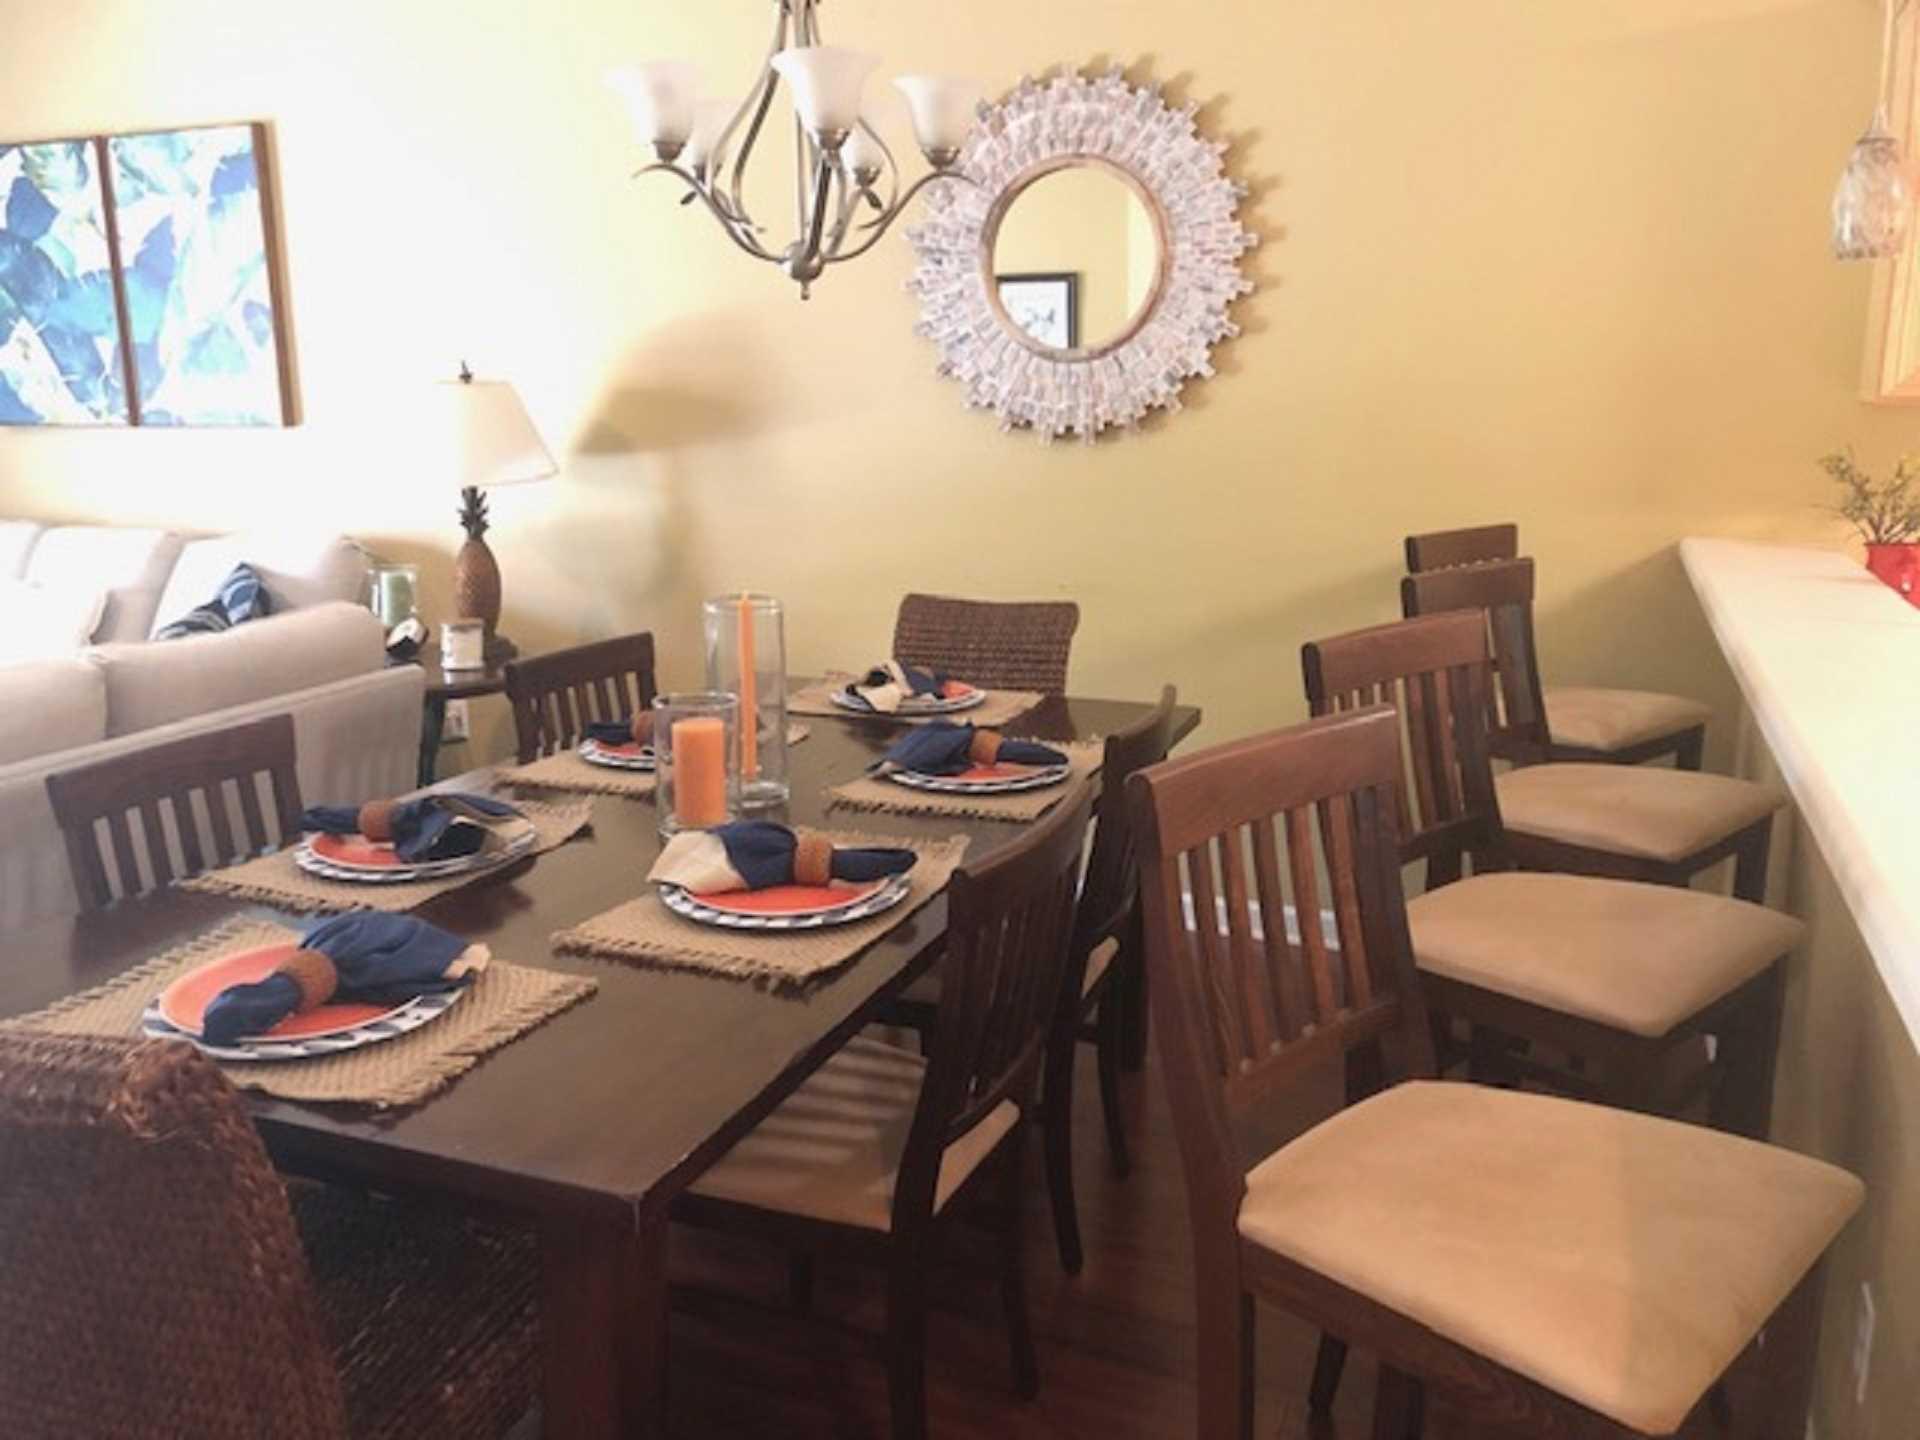 New Dining Room Decor